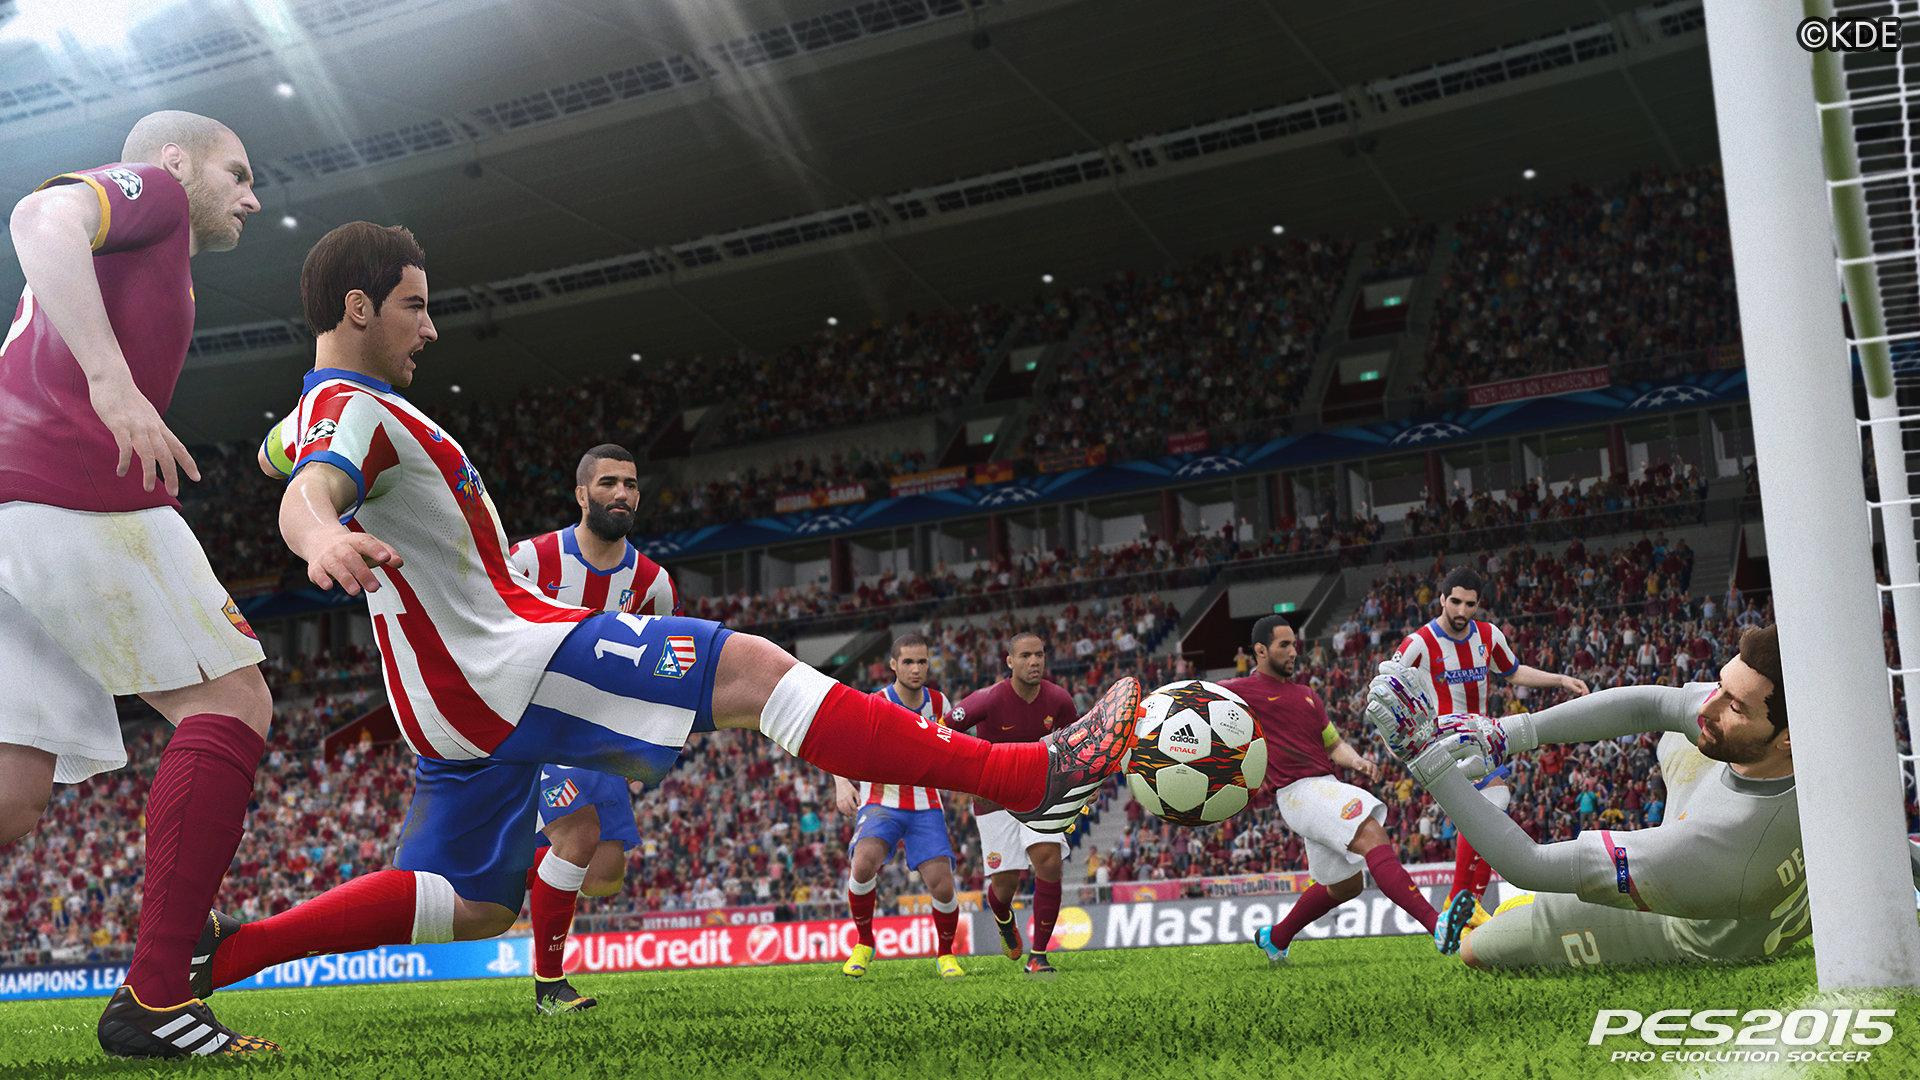 Pro Evolution Soccer 2015 Screenshot 8 70f44e1577e13